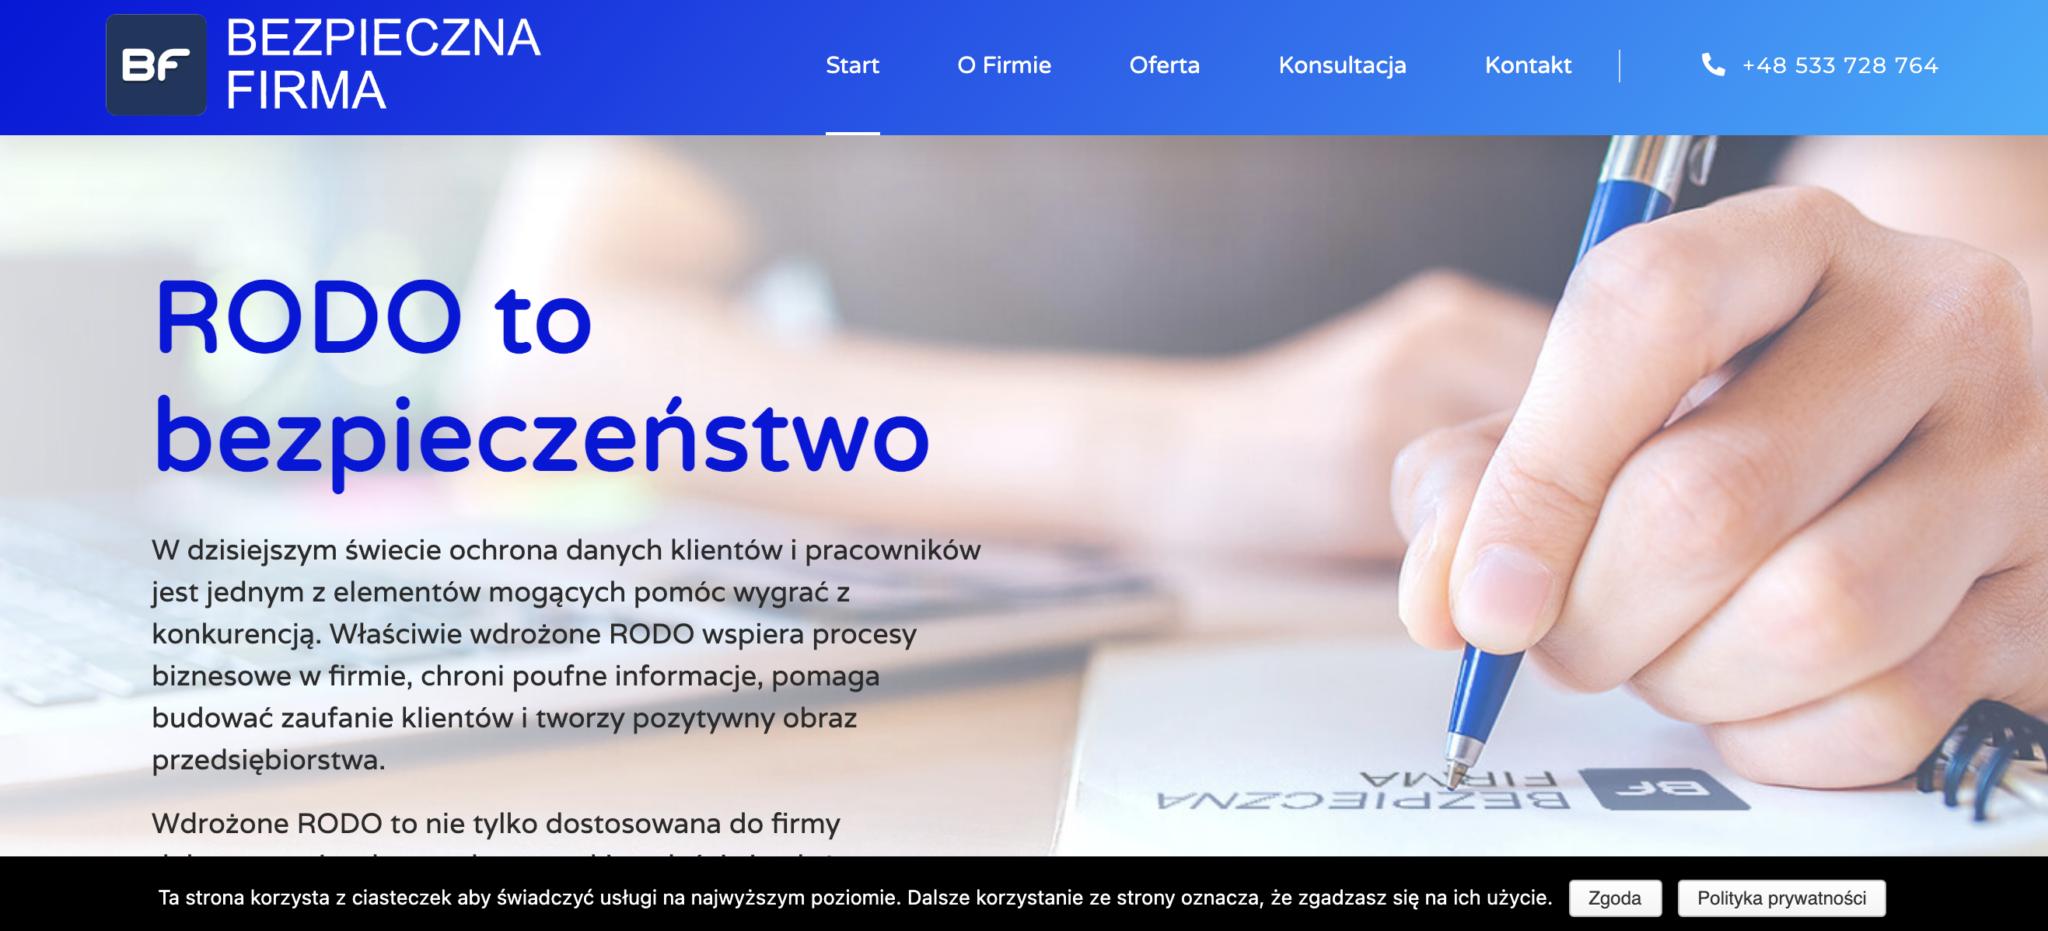 Zrzut ekranu 2021-03-25 o 14.09.57